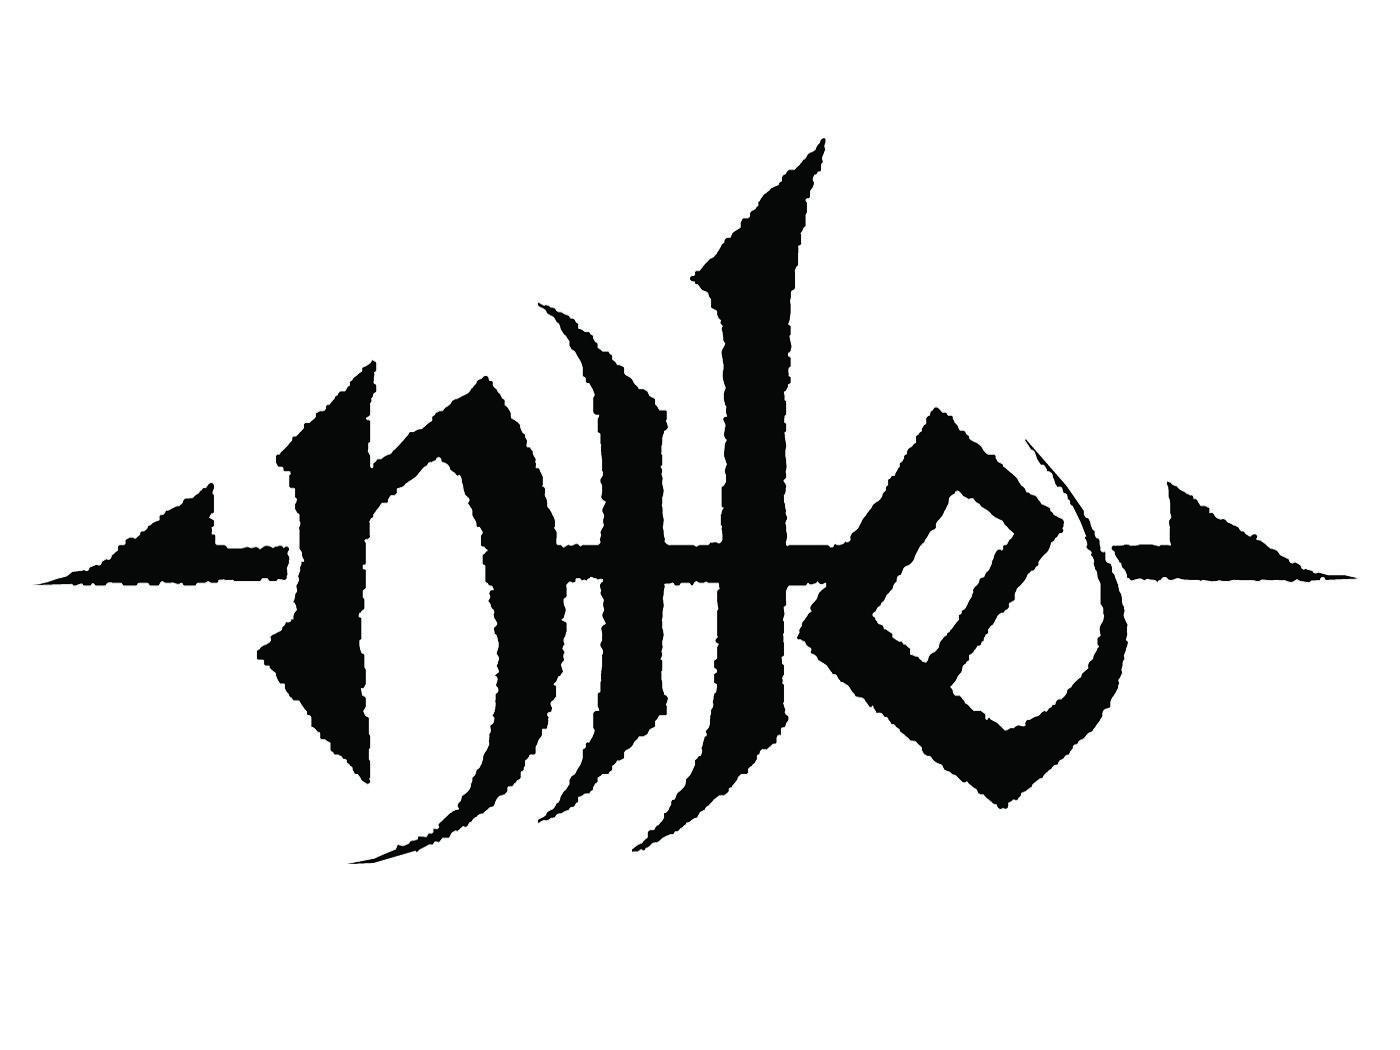 pin by nilton cezar on logos irados pinterest rh pinterest co uk behemoth band logo meaning Behemoth Band Logo Goat